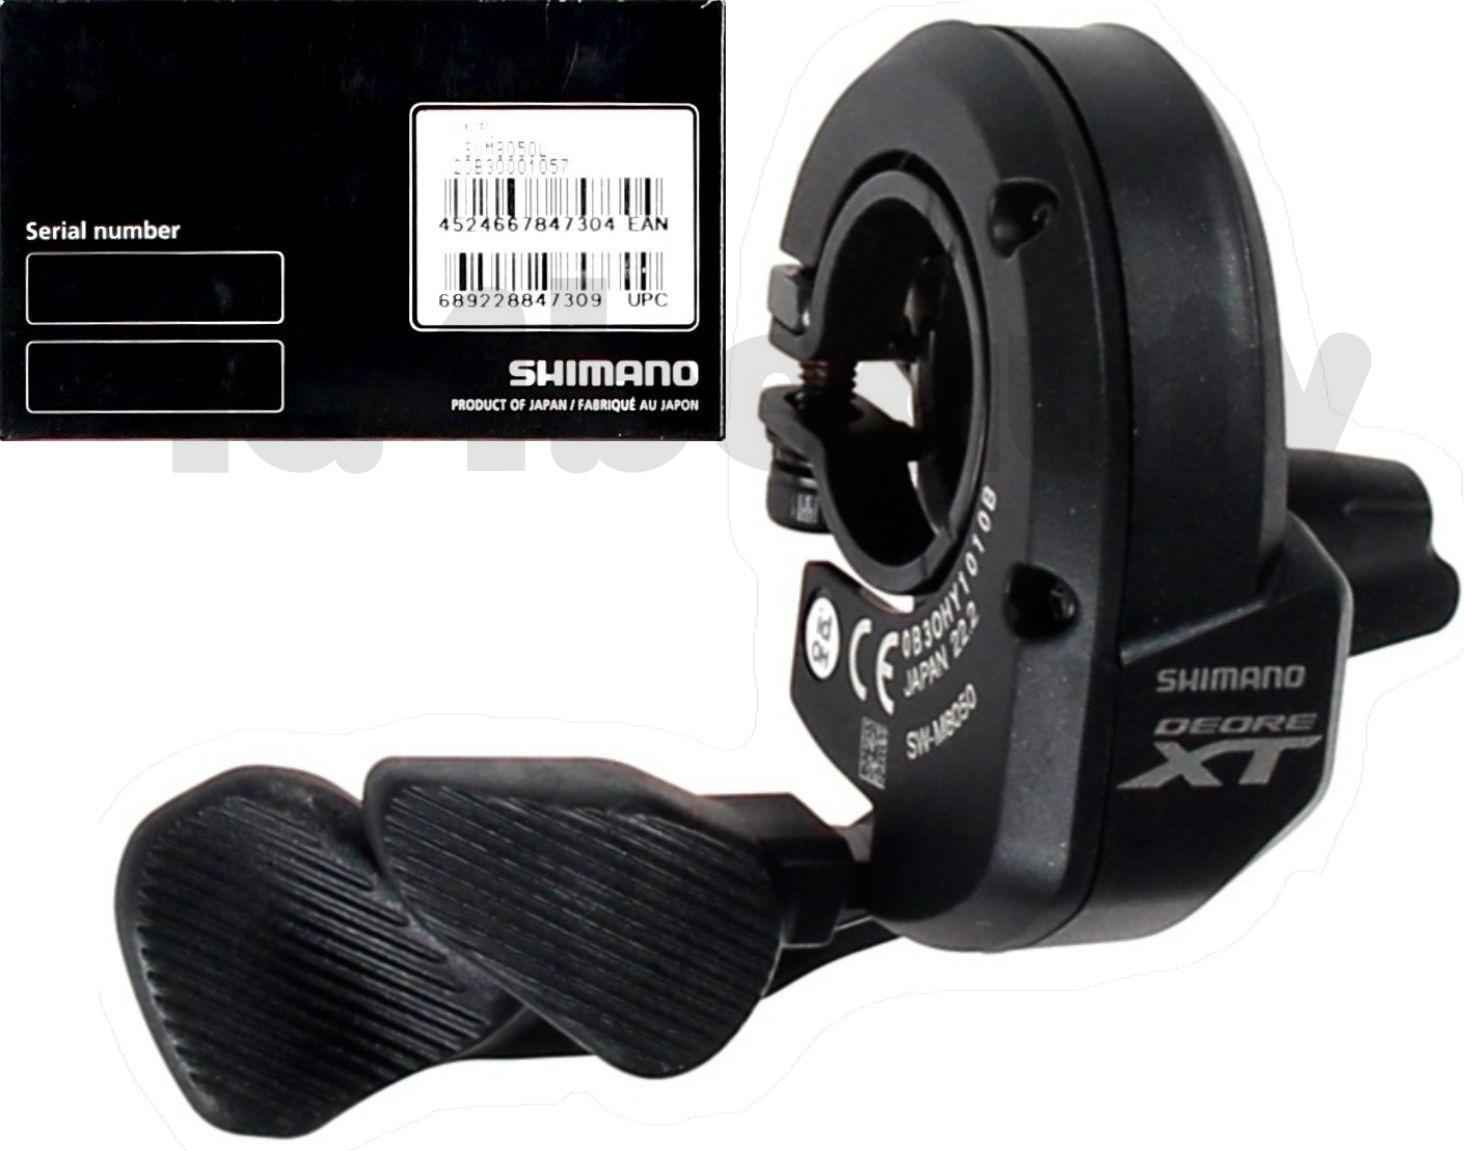 ISWM8050L Left Only Shimano XT Di2 SW-M8050 Firebolt Shifter 3//2-Speed